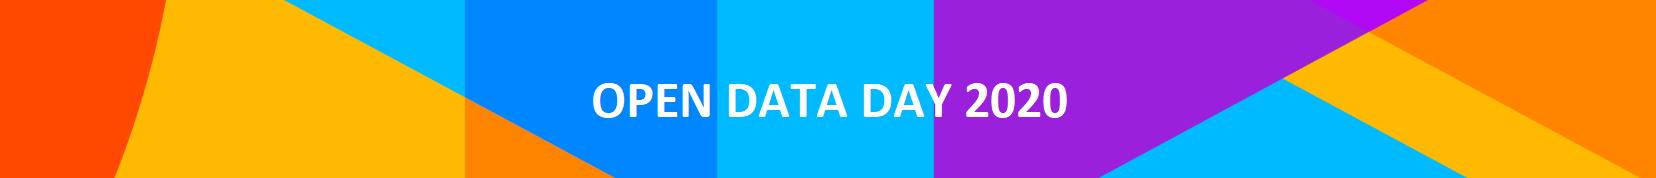 Open Data Banner 2020